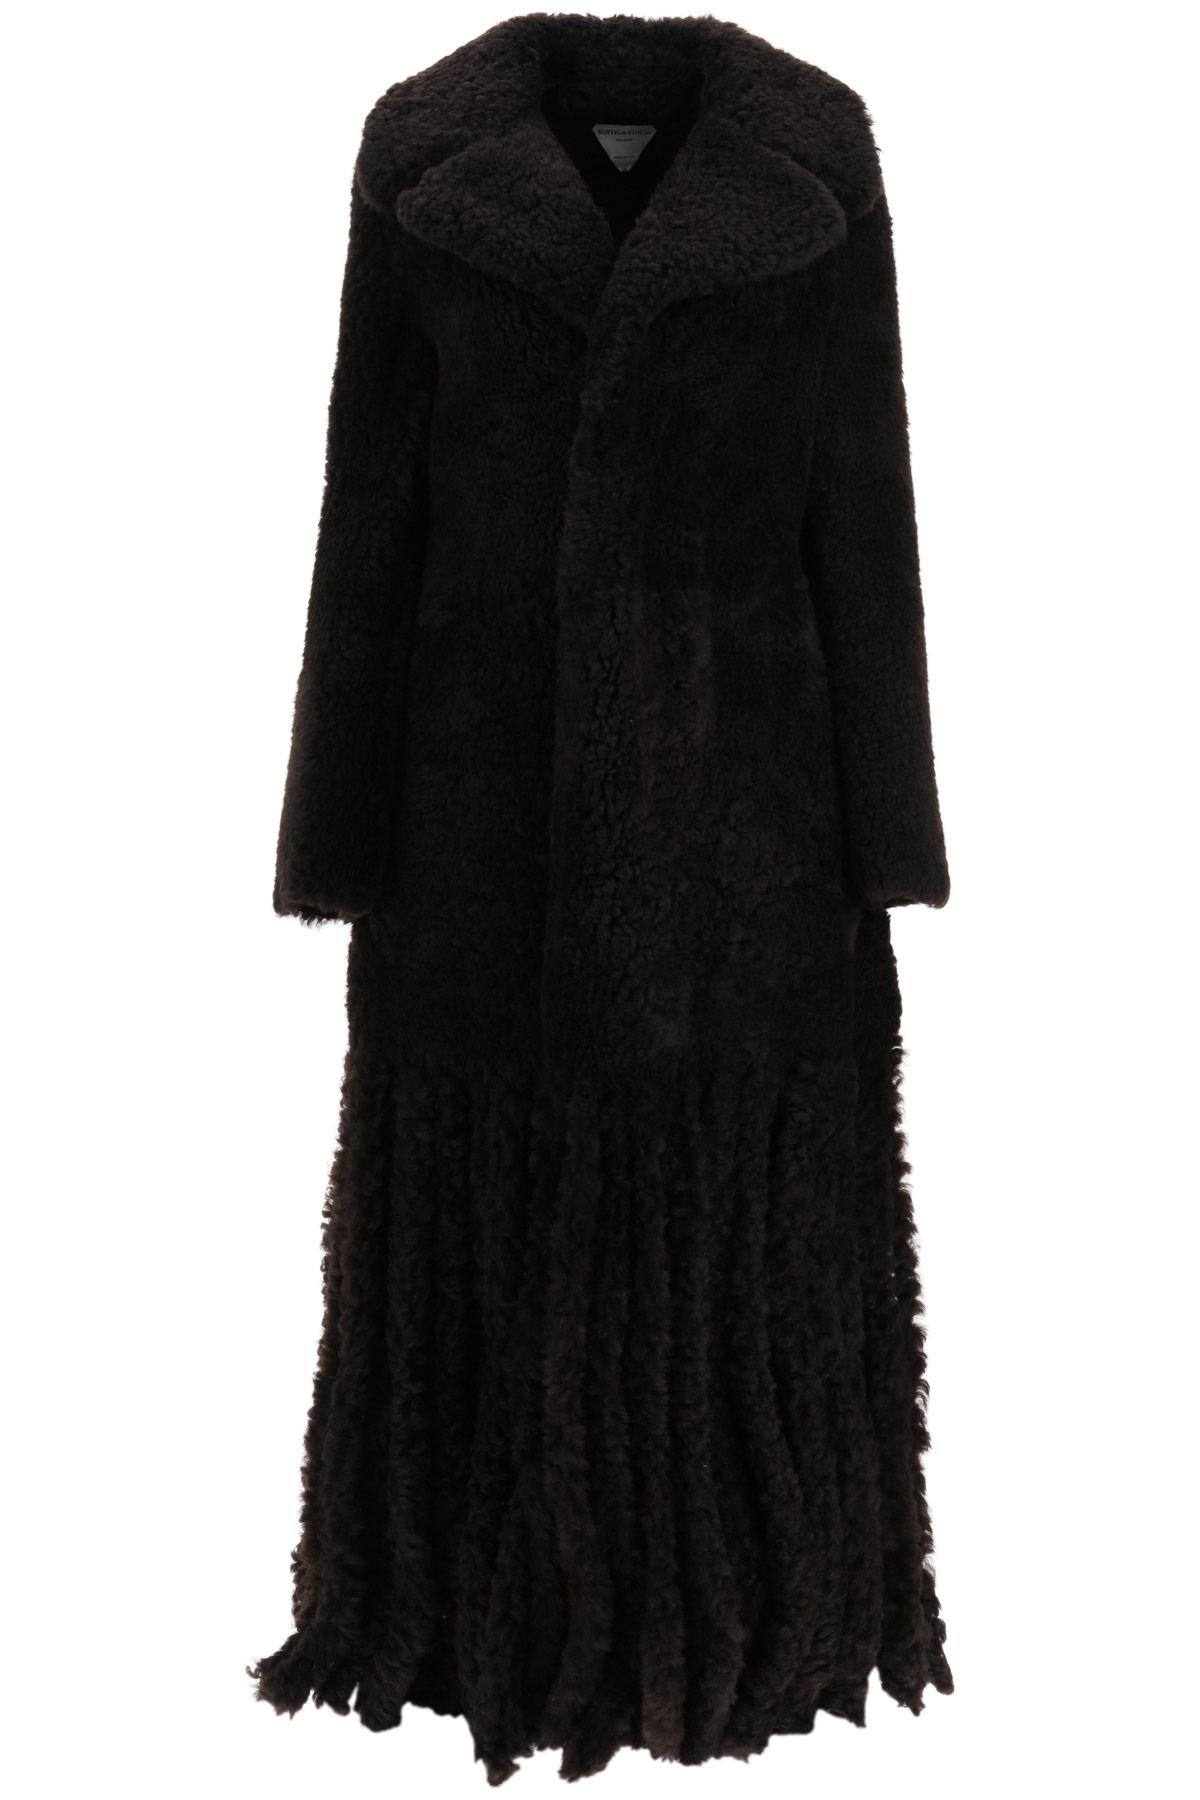 BOTTEGA VENETA SHEARLING COAT WITH FRINGES 40 Brown Leather, Fur